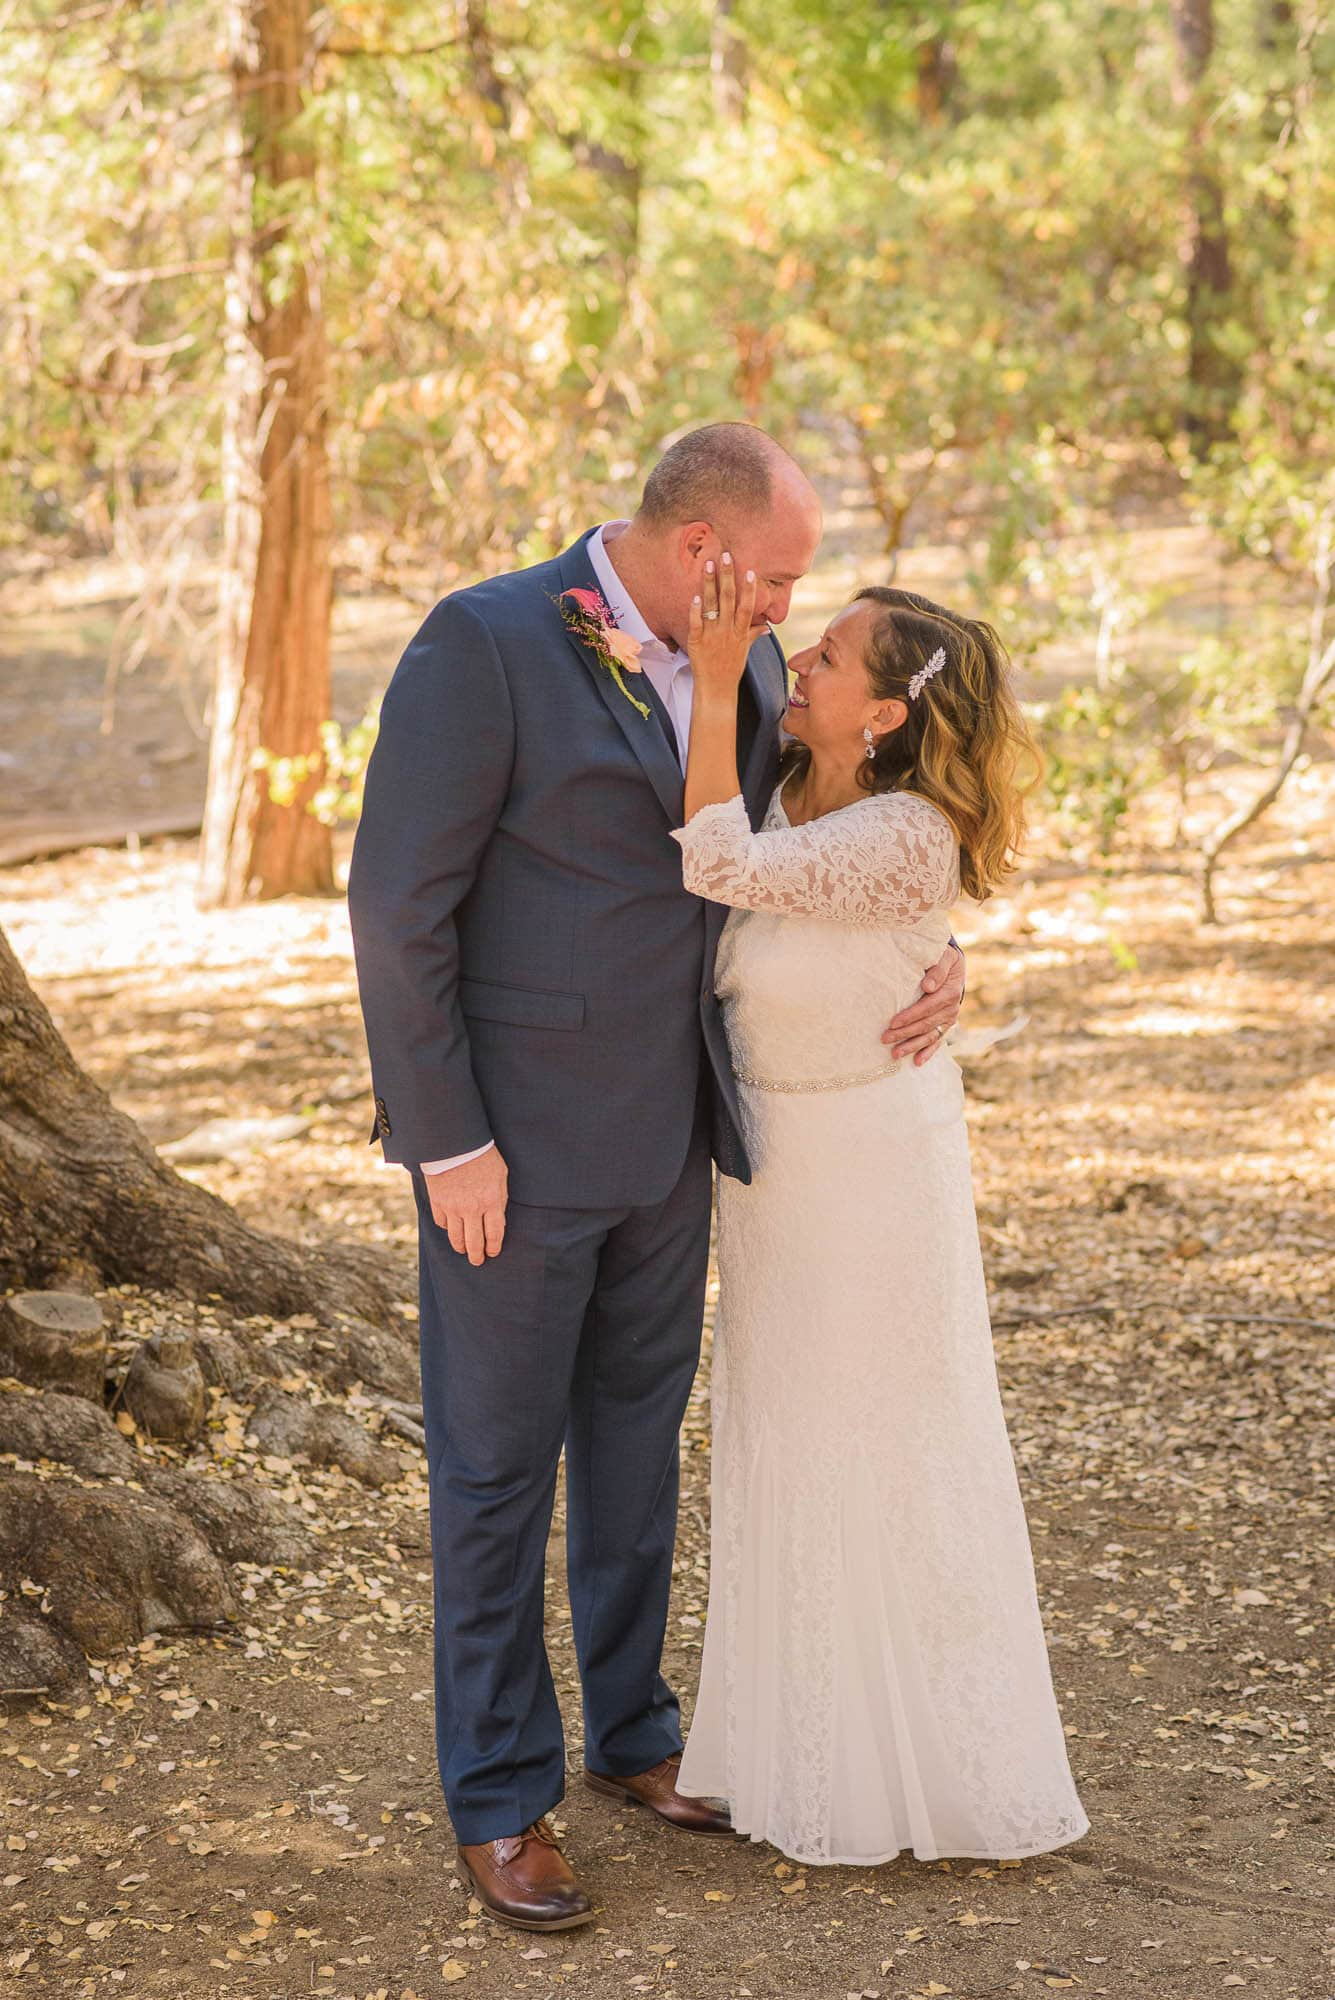 023_Alan_and_Heidi_Wedding_Jackie_Dannon